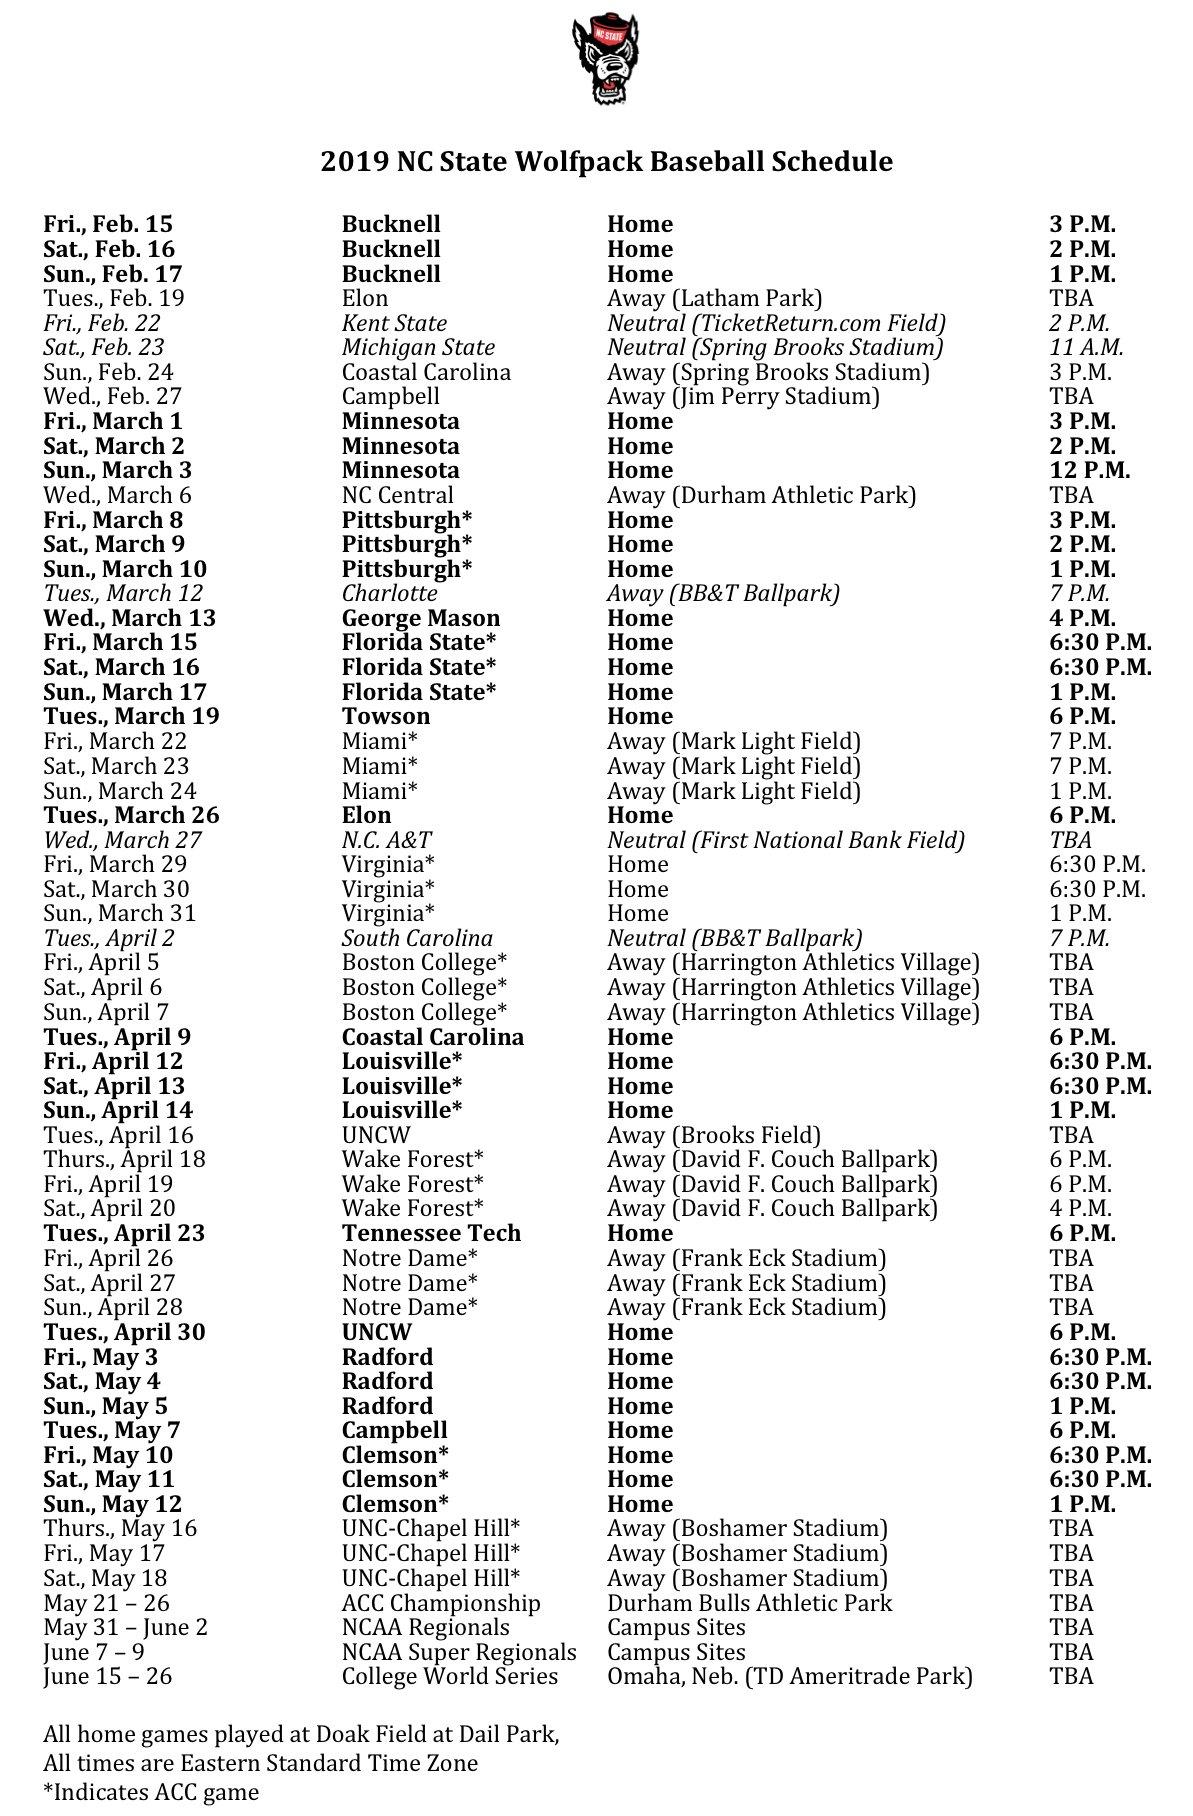 Nc State Releases 2019 Baseball Schedule – Pack Insider Calendar 2019 Ncsu